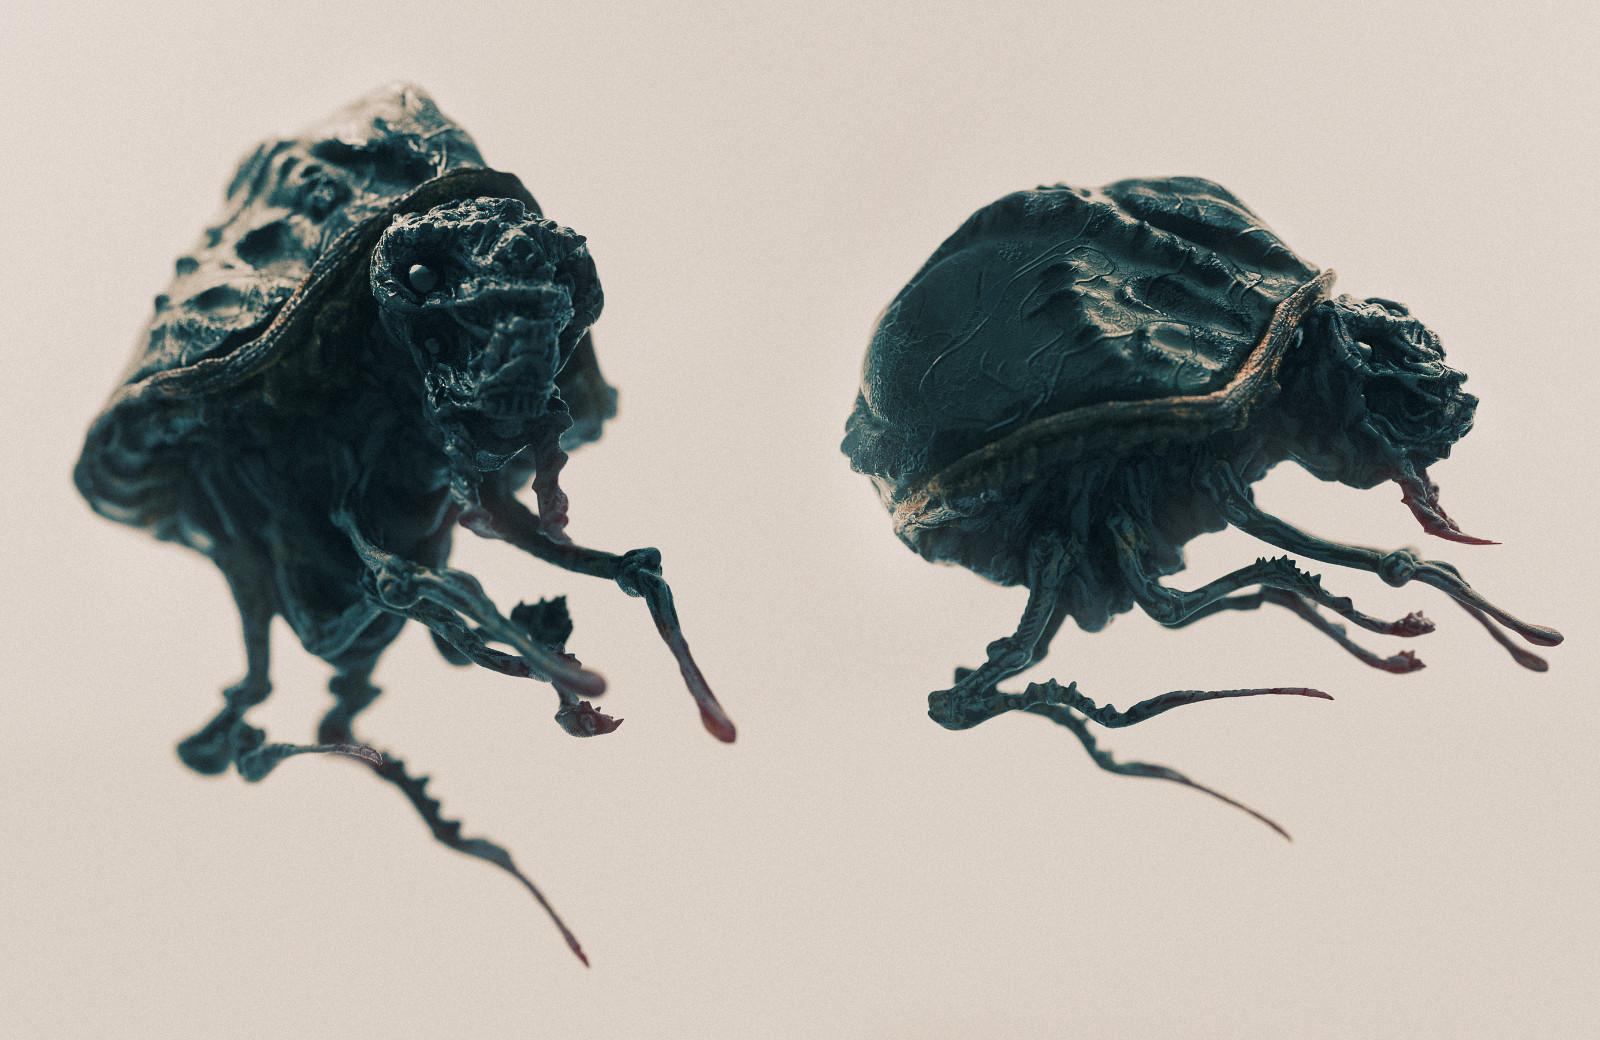 Creature Detail